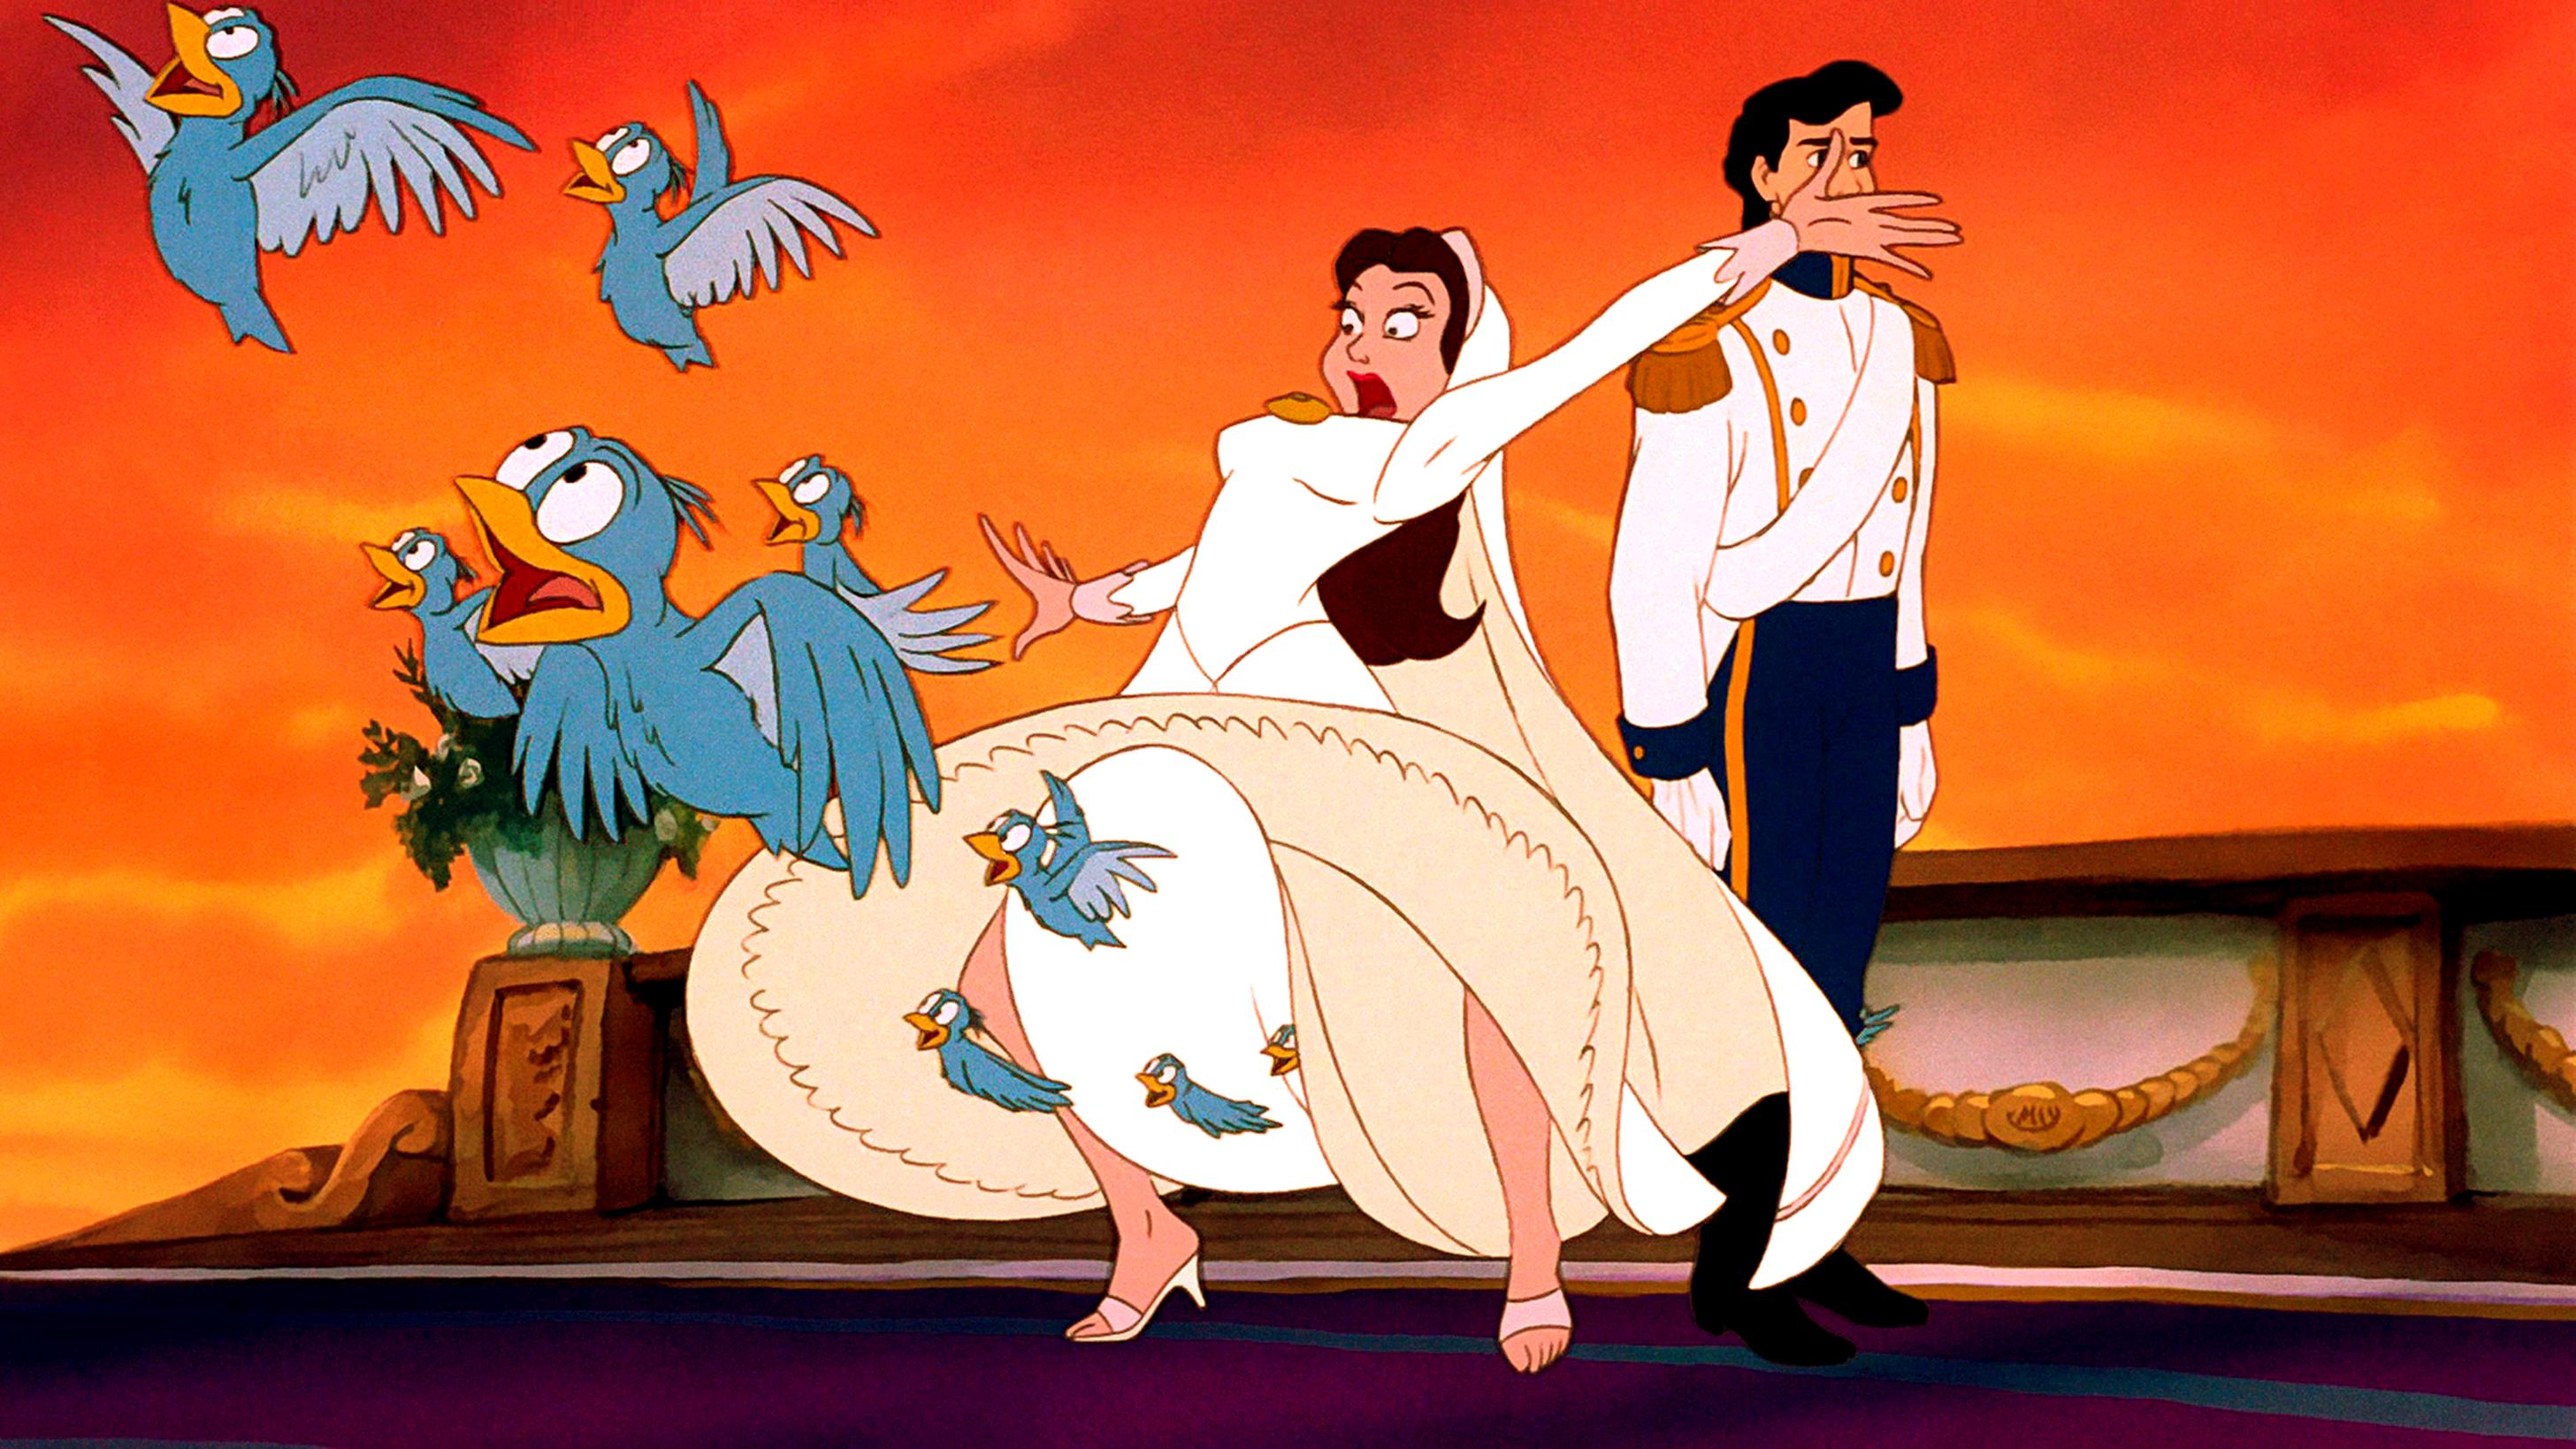 Walt Disney Screencaps – The Blue Birds, Vanessa & Prince Eric